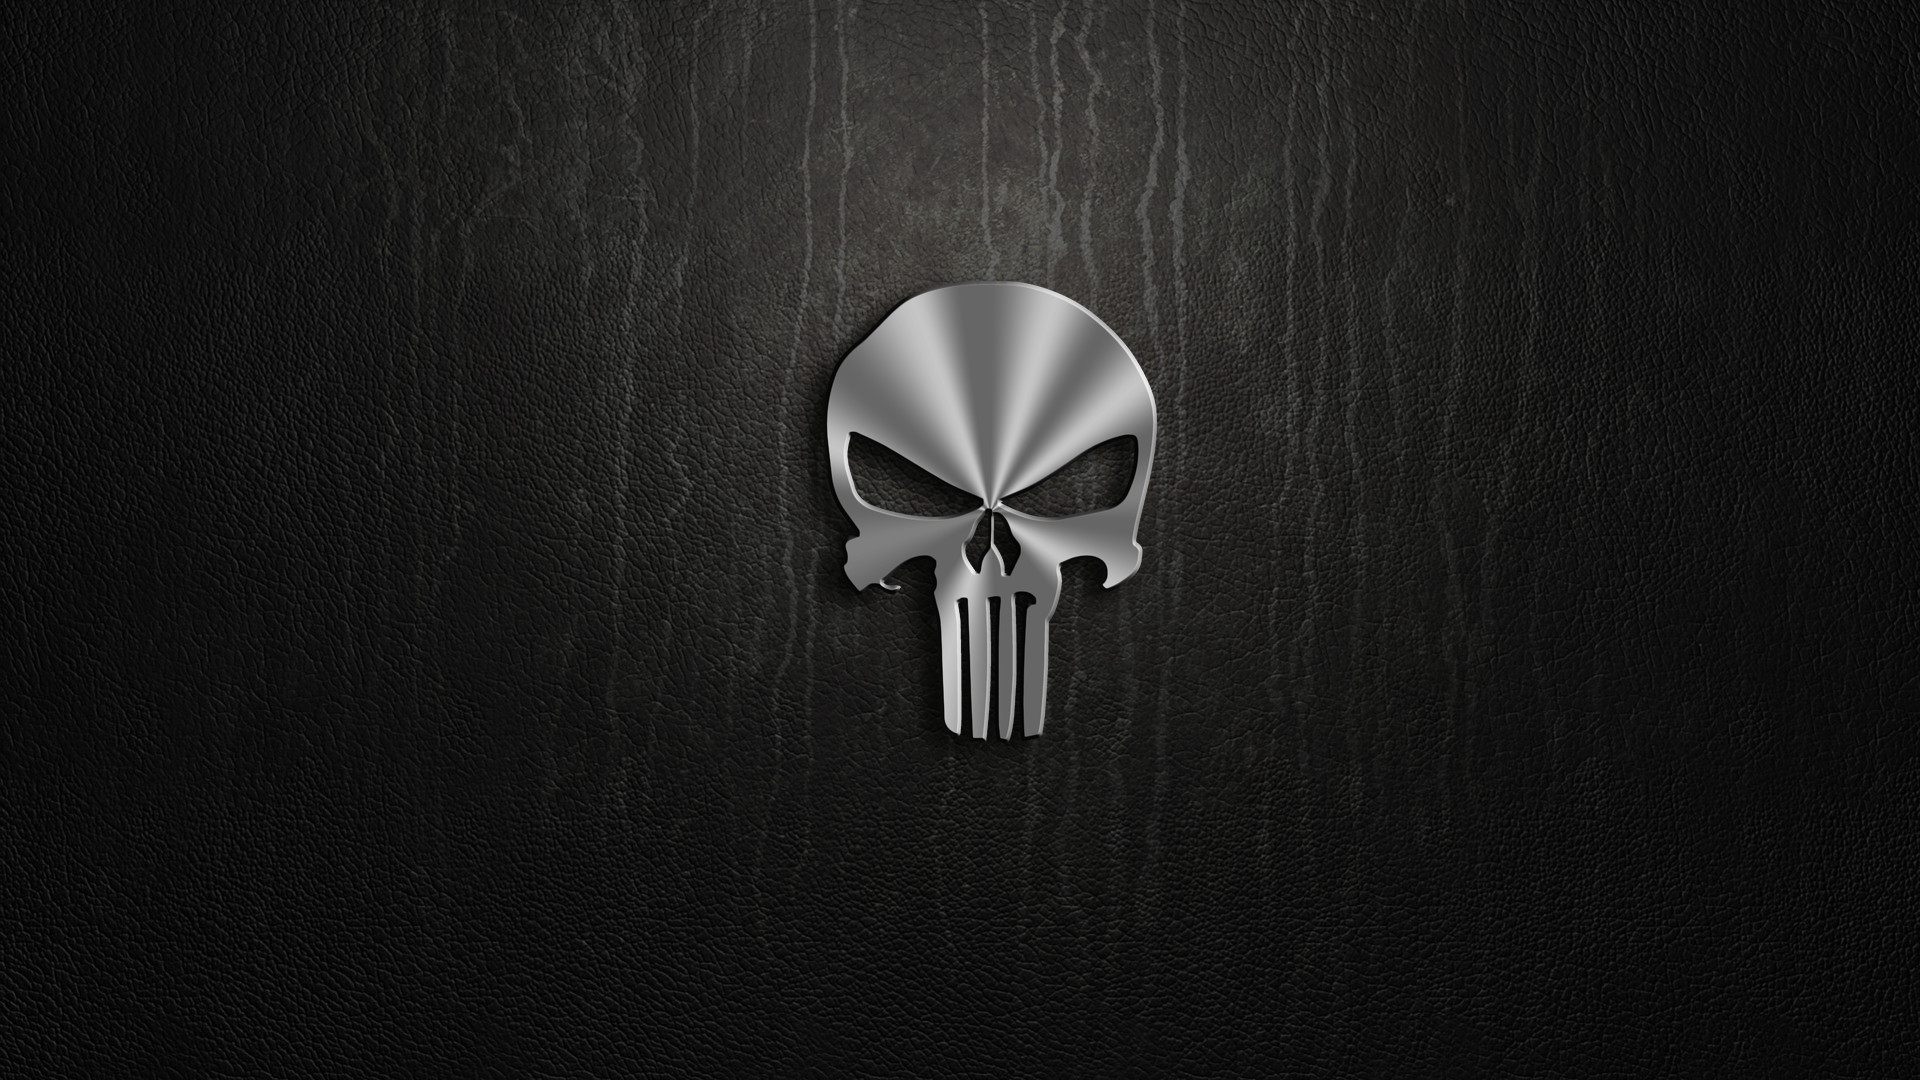 HD Wallpaper | Background ID:402208. Comics The Punisher